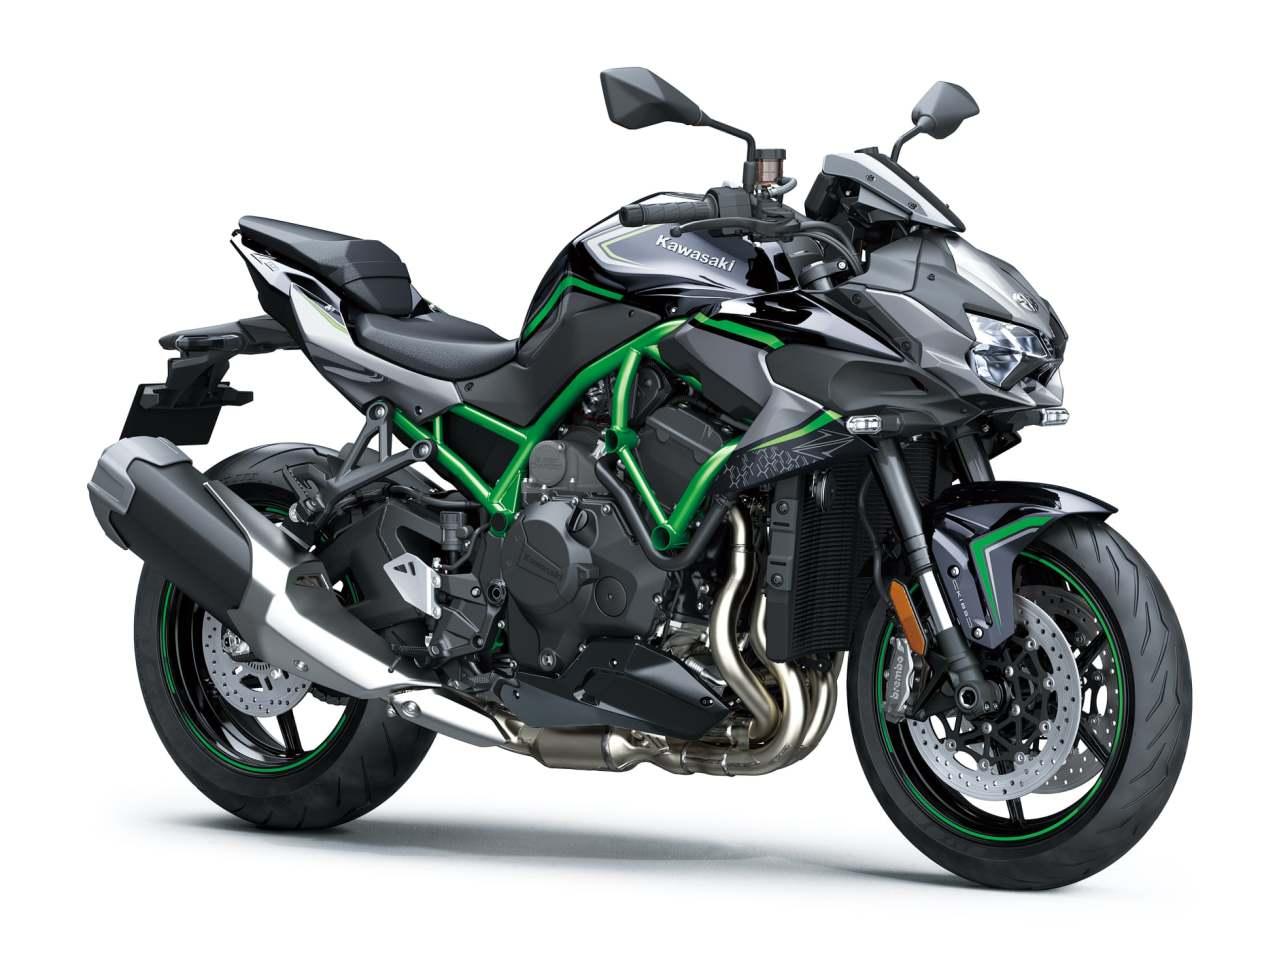 موتورسیکلت کاوازاکی Z H2 رونمایی شد